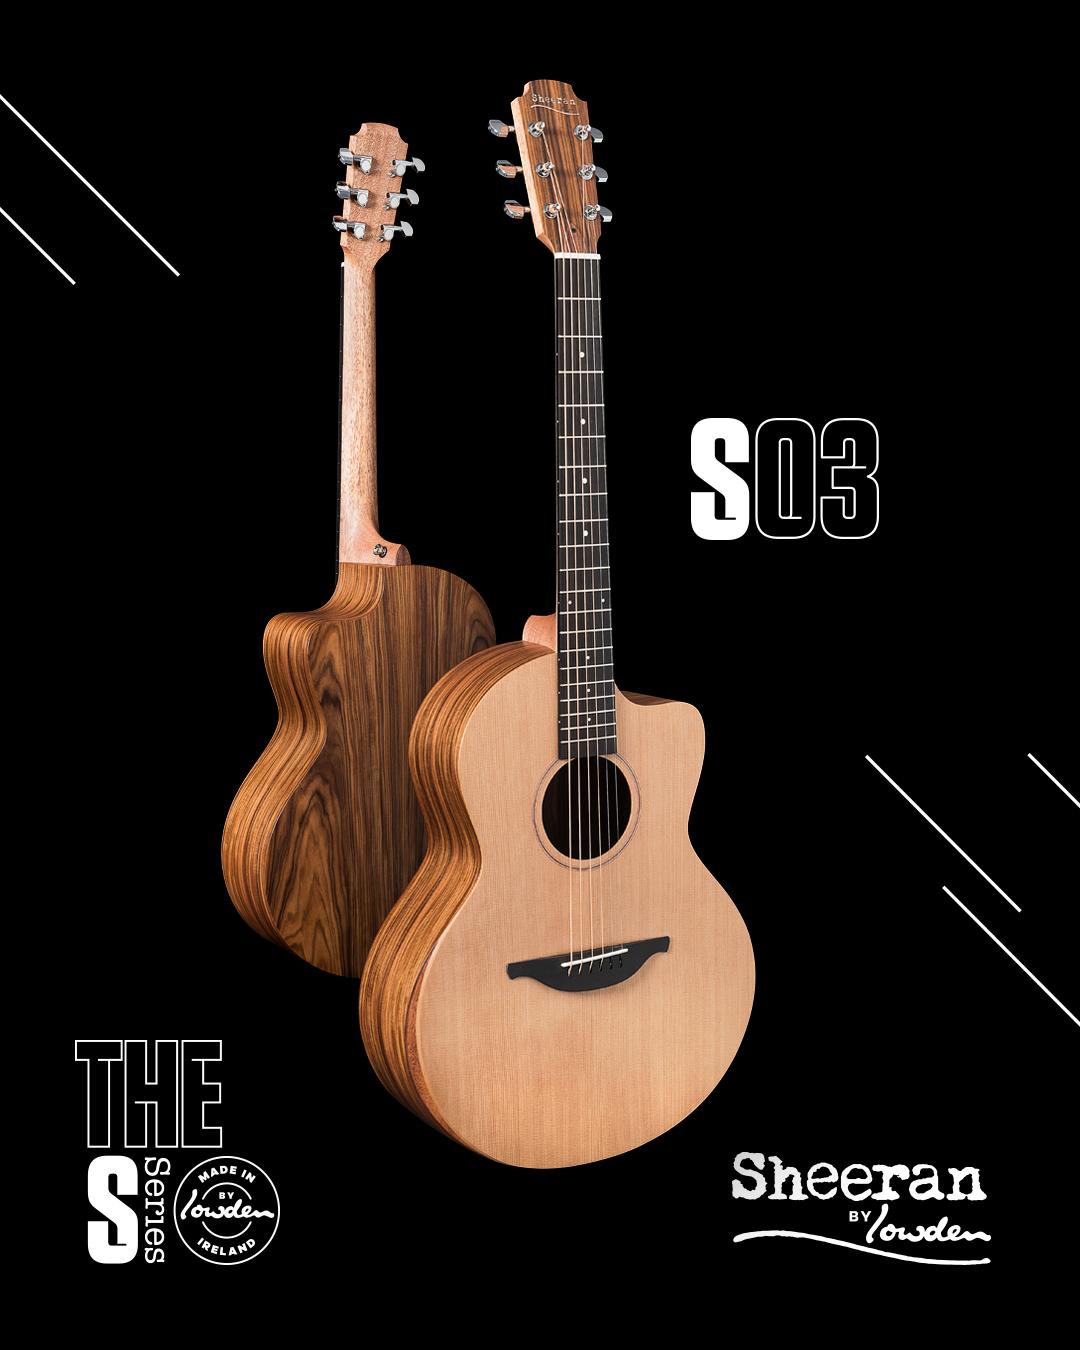 Sheeran by Lowden S-03 Cedar/Rosewood Cutaway Guitar w/ LR Baggs Pickup (PRE ORDER)